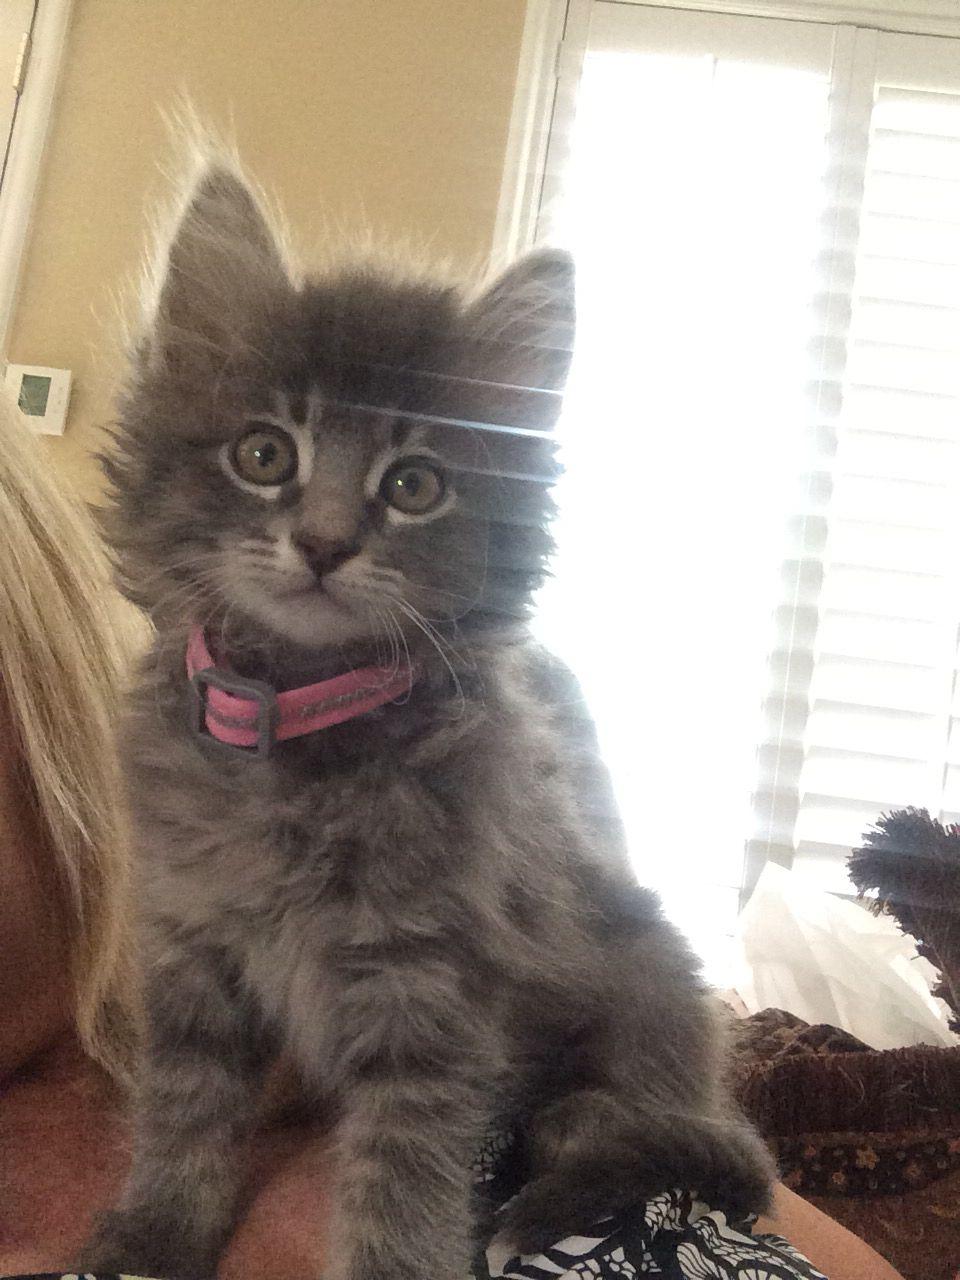 Ten Week Old Domestic Kitten Her Name Is Bleu Kitten Love Kitten Love Kitten Feline